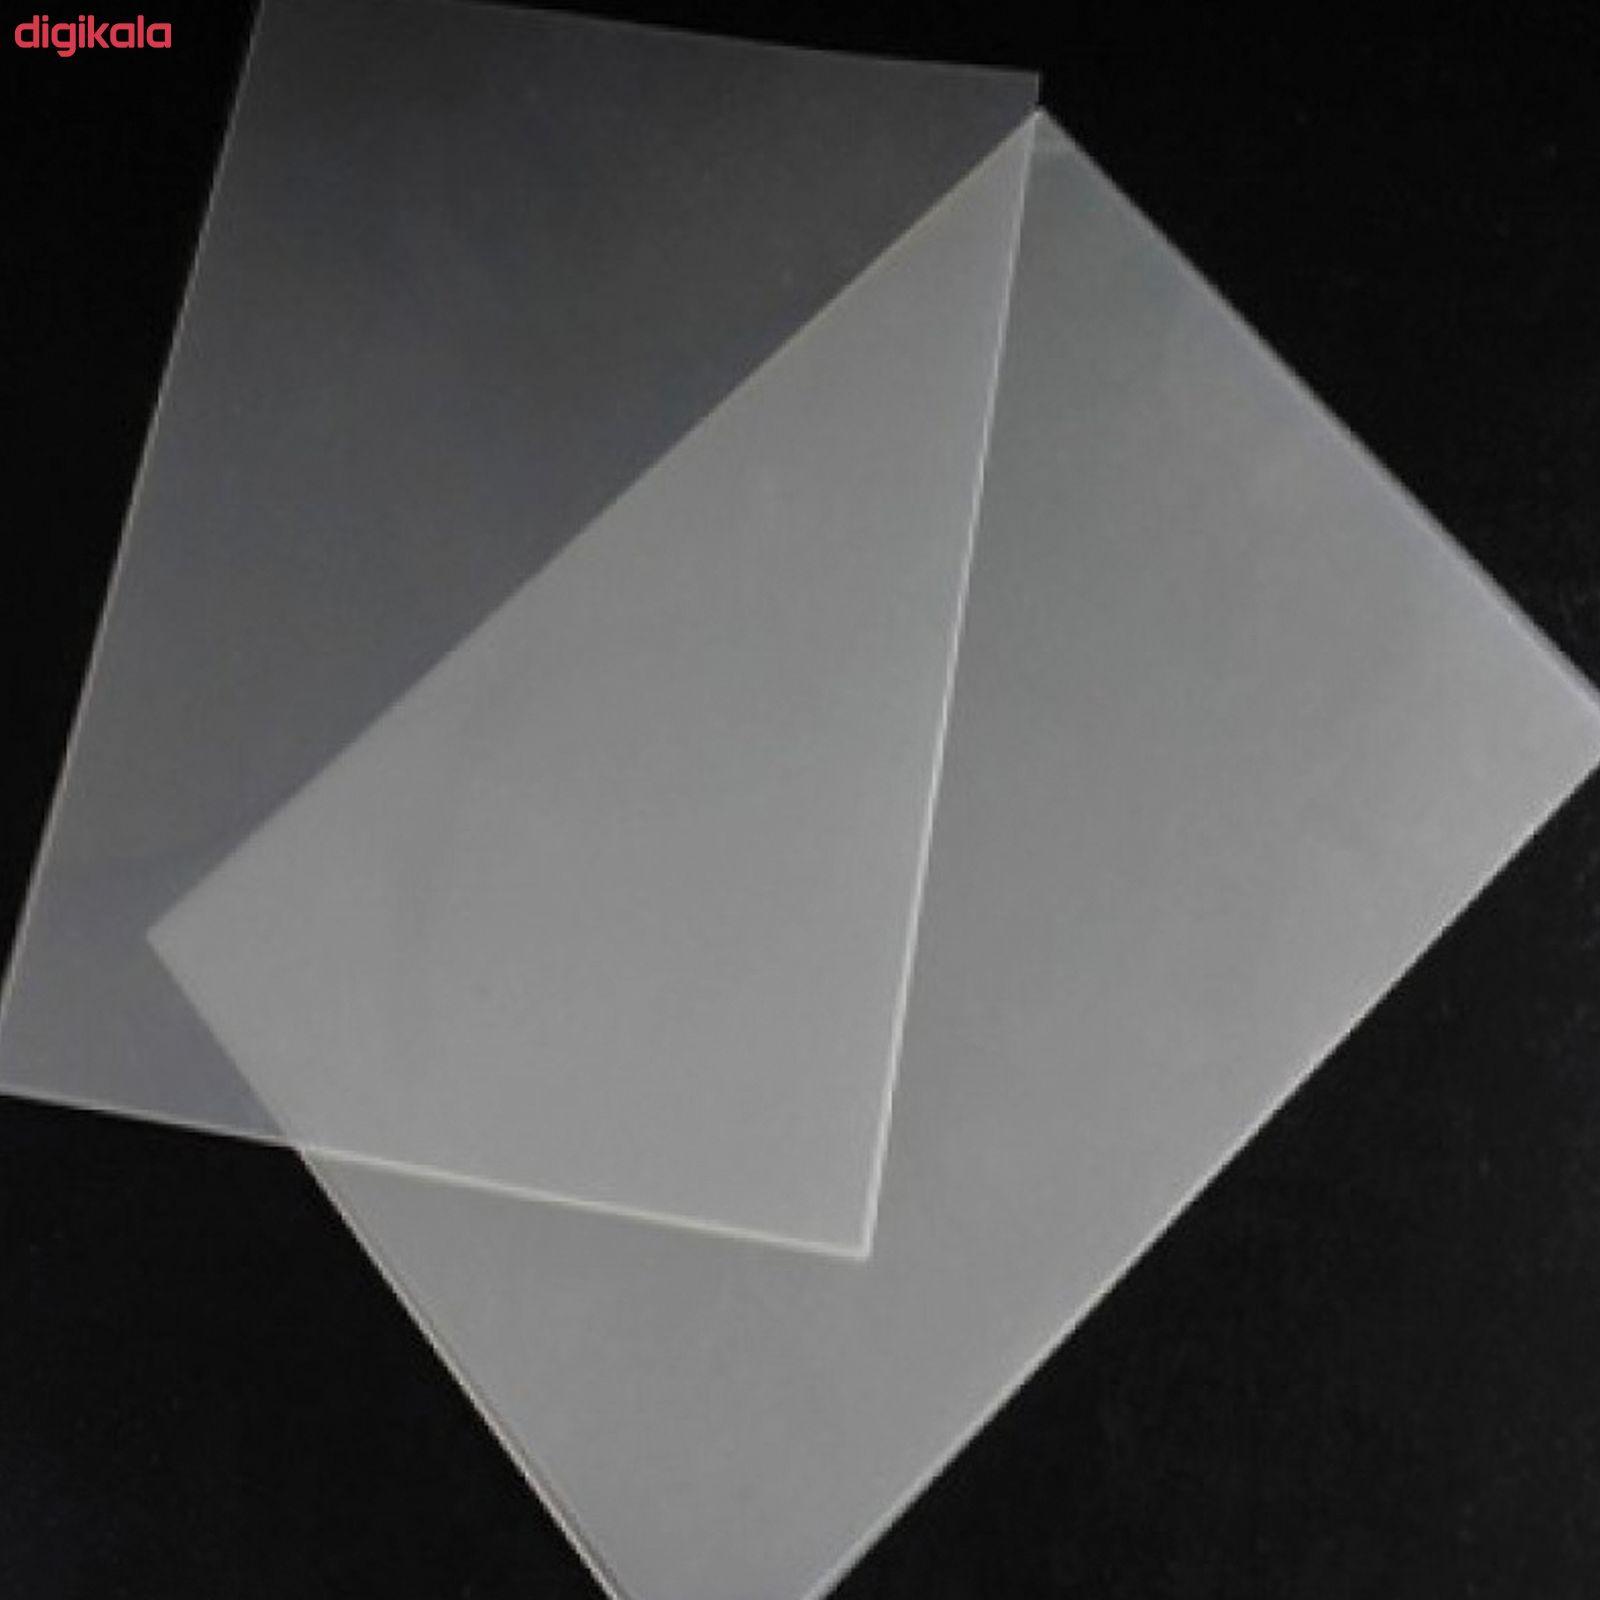 کاغذ پوستی A3 مدل cnd38 بسته 50 عددی  main 1 2